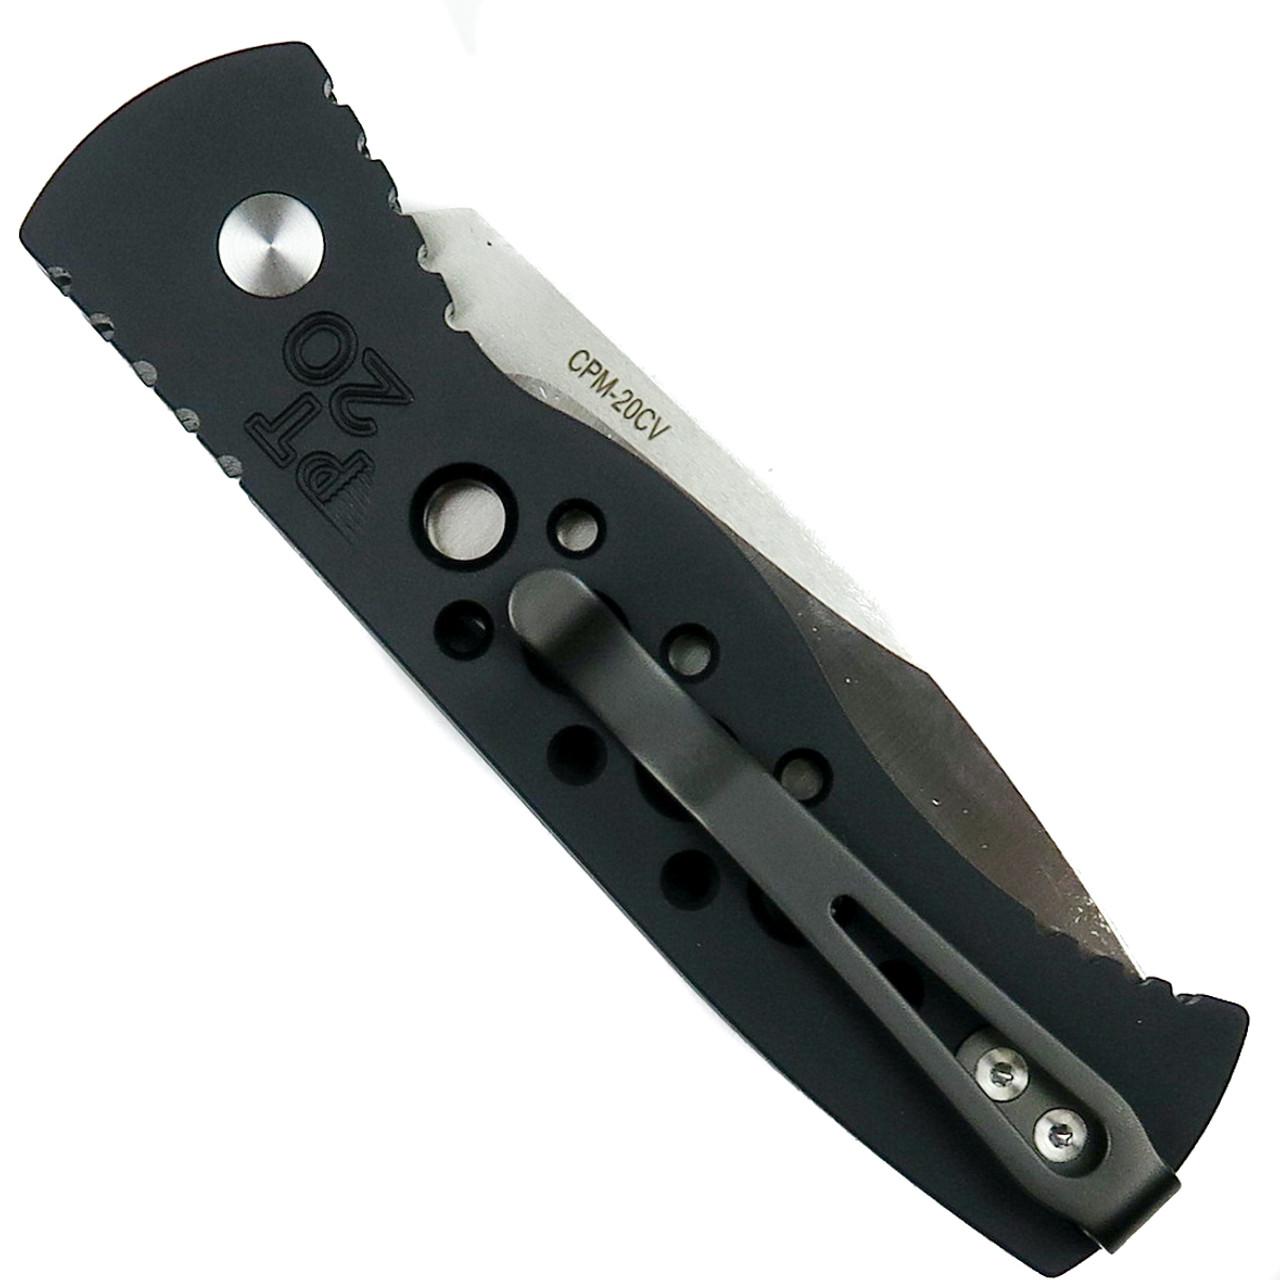 Pro-Tech 20th Anniversary TR-2 Auto Knife, CPM-20CV Blade Back View